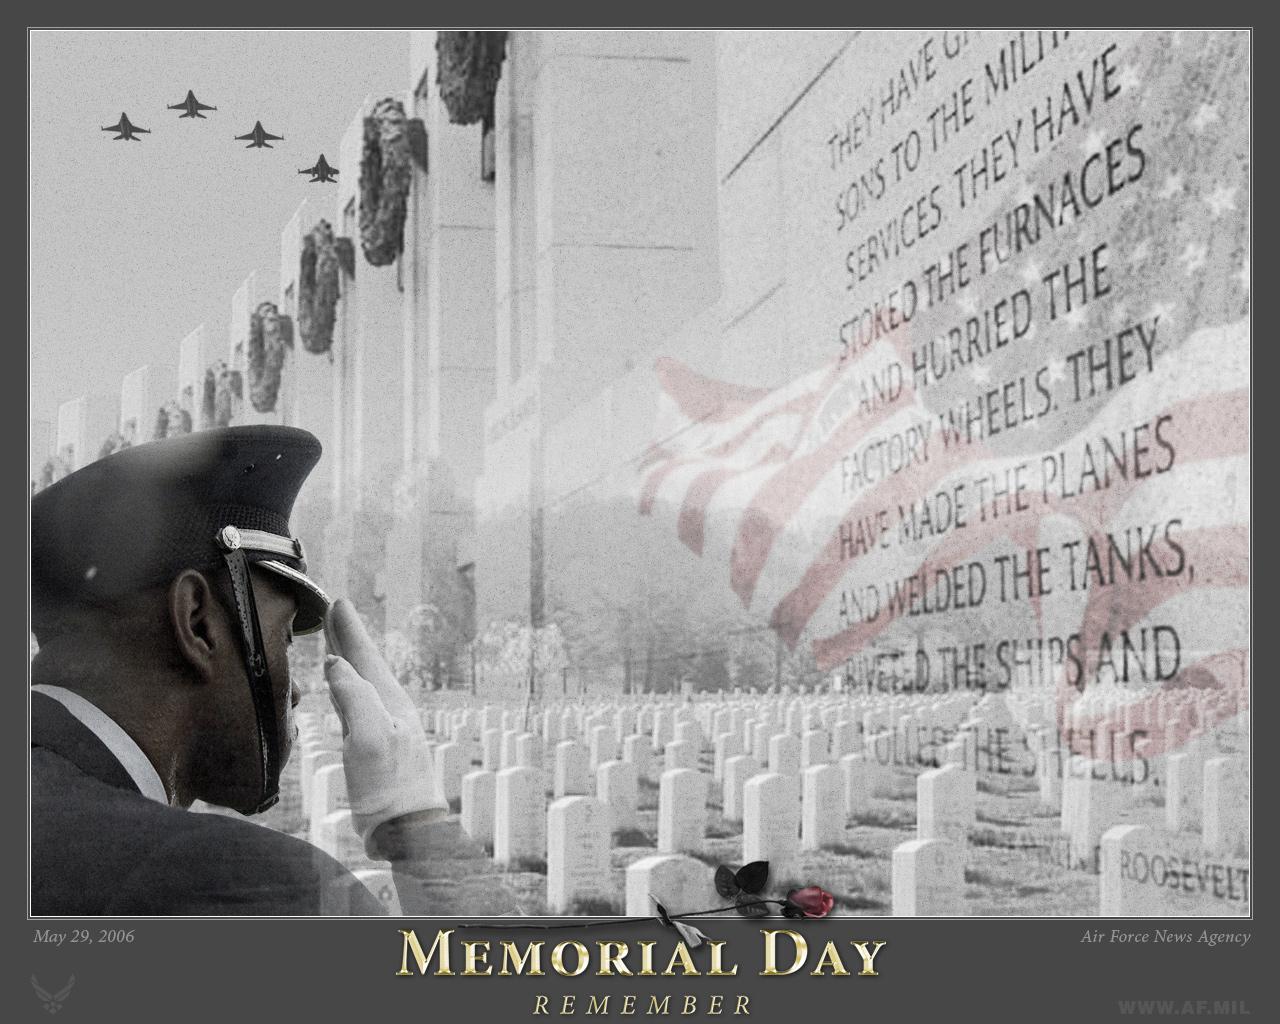 Memorial Day Wallpaper 1 1280x1024 1280x1024